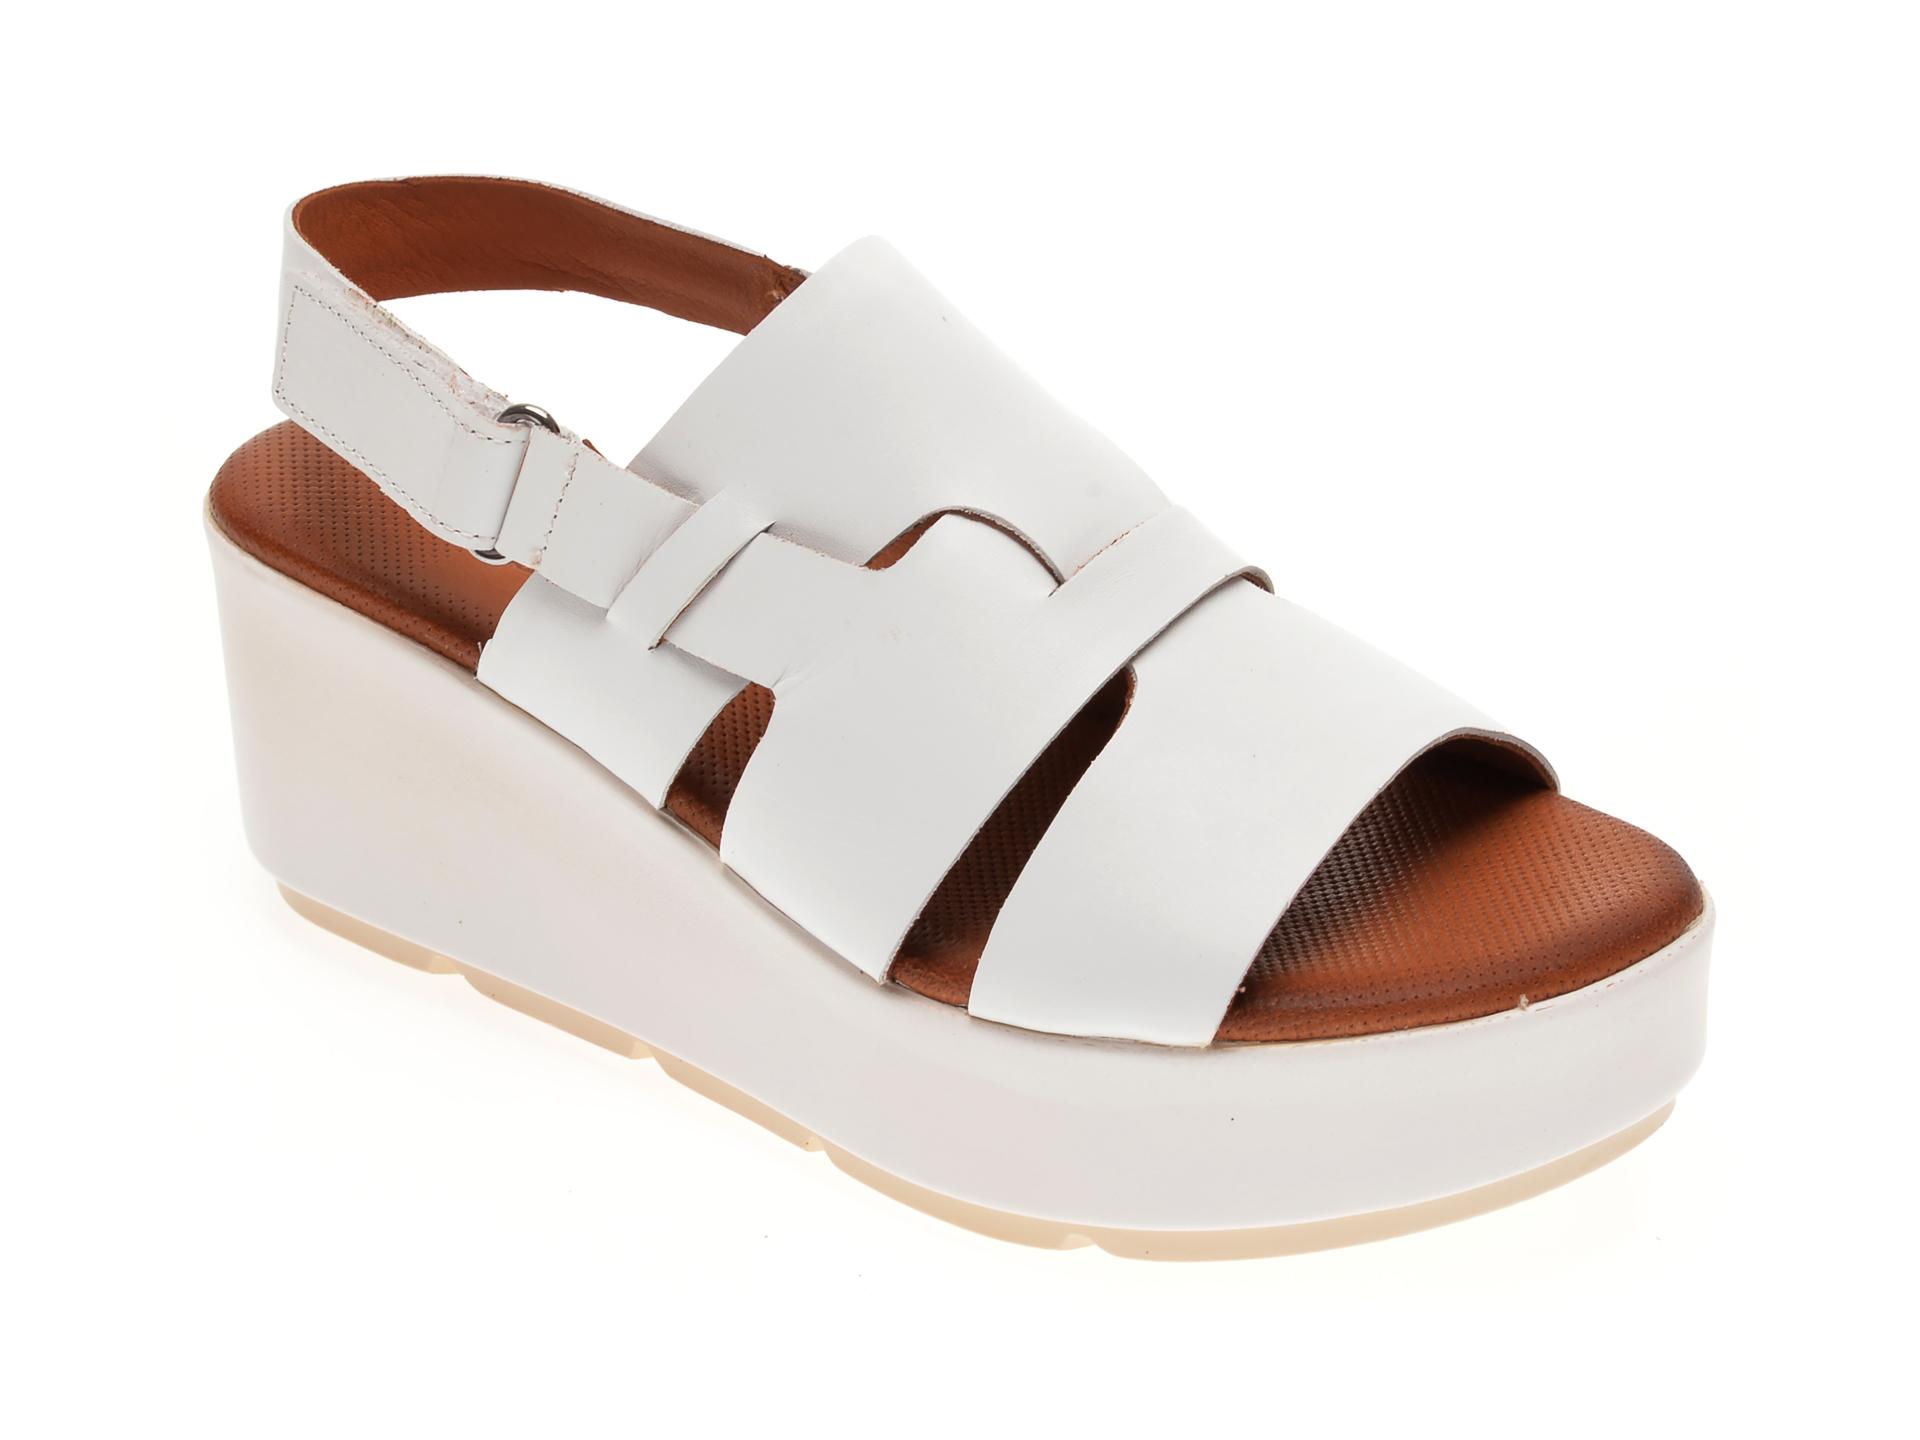 Sandale BABOOS albe, 2519, din piele naturala